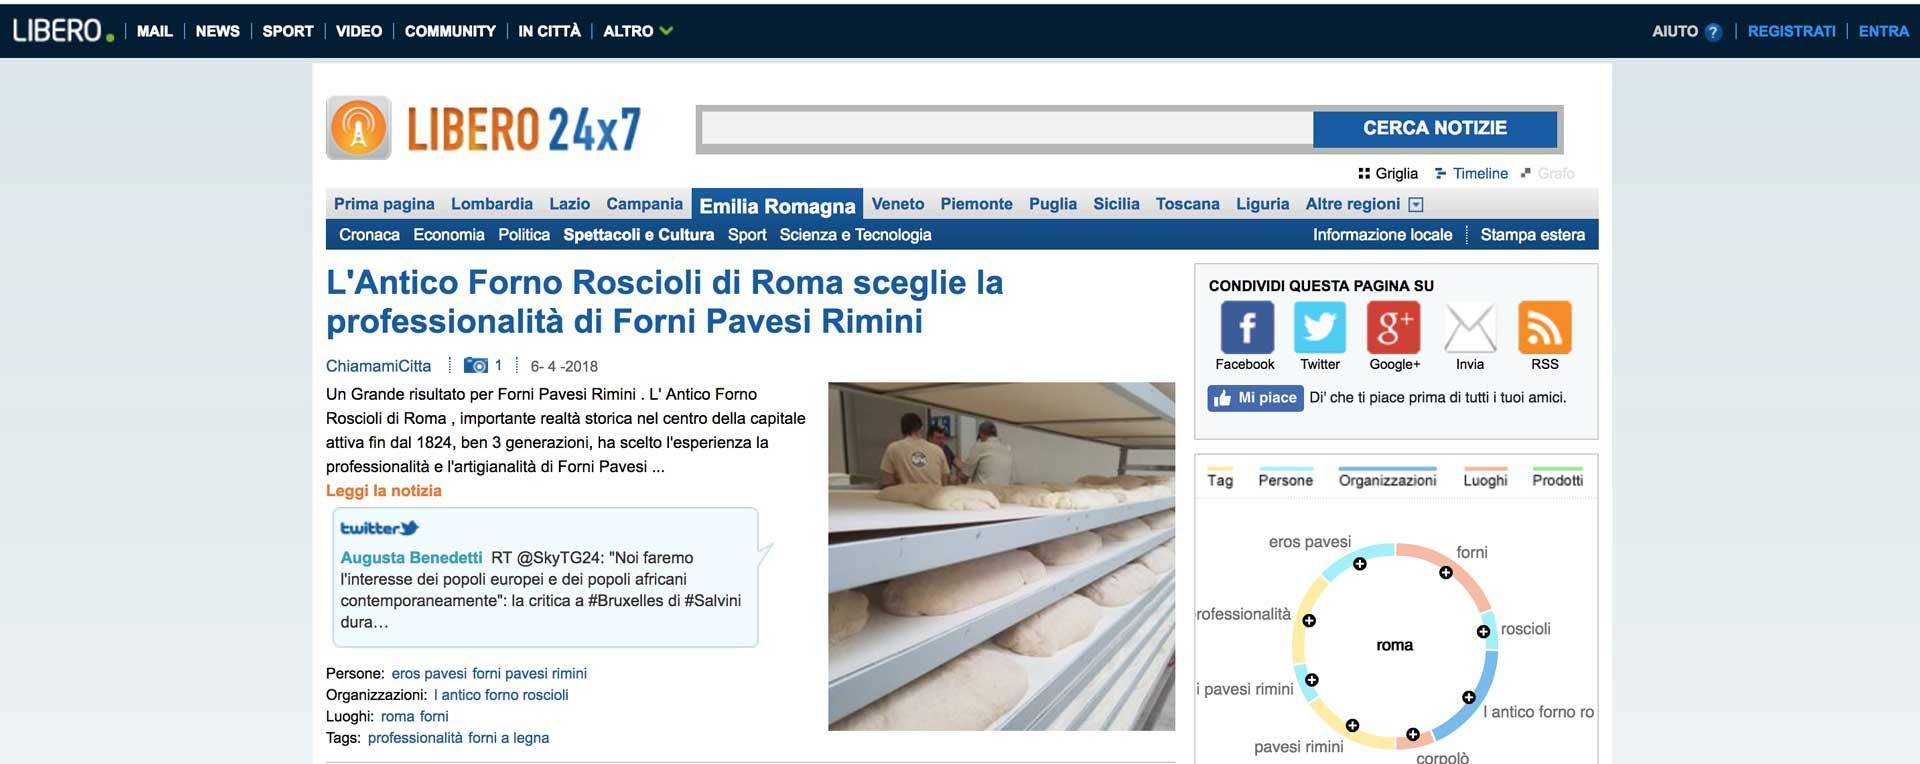 Forni Pavesi Rimini a Roma